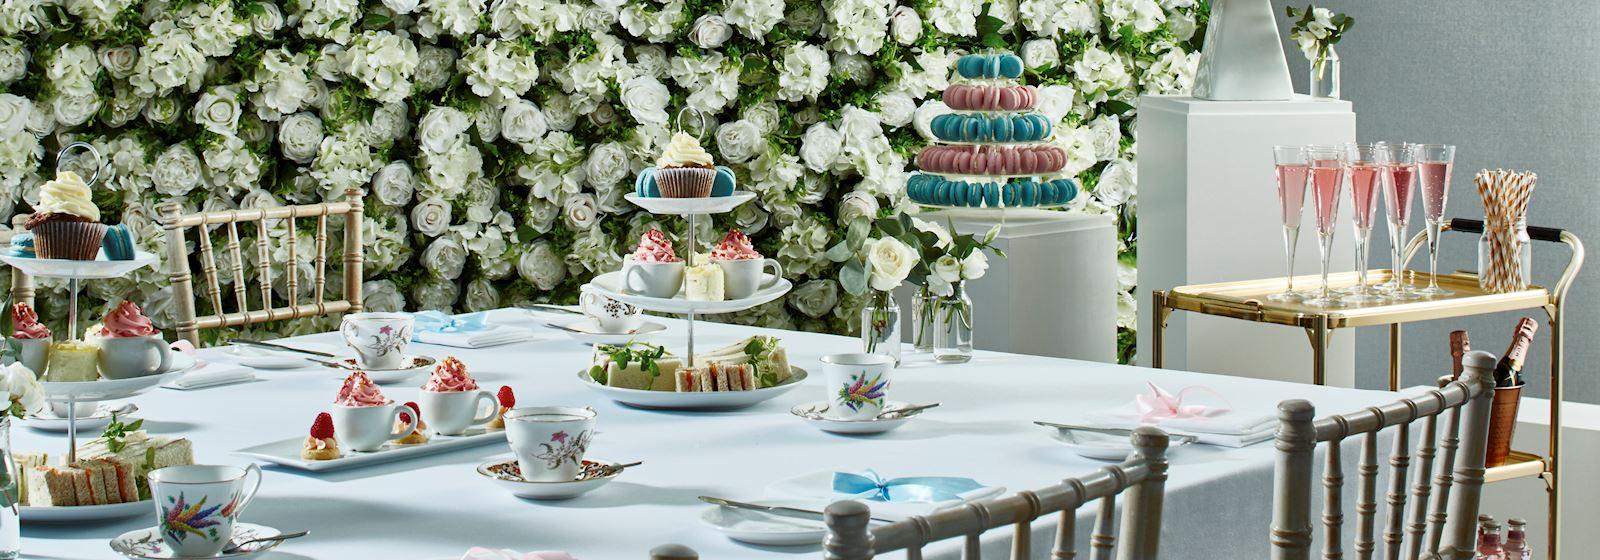 London Marriott Hotel Kensington Special Occasions